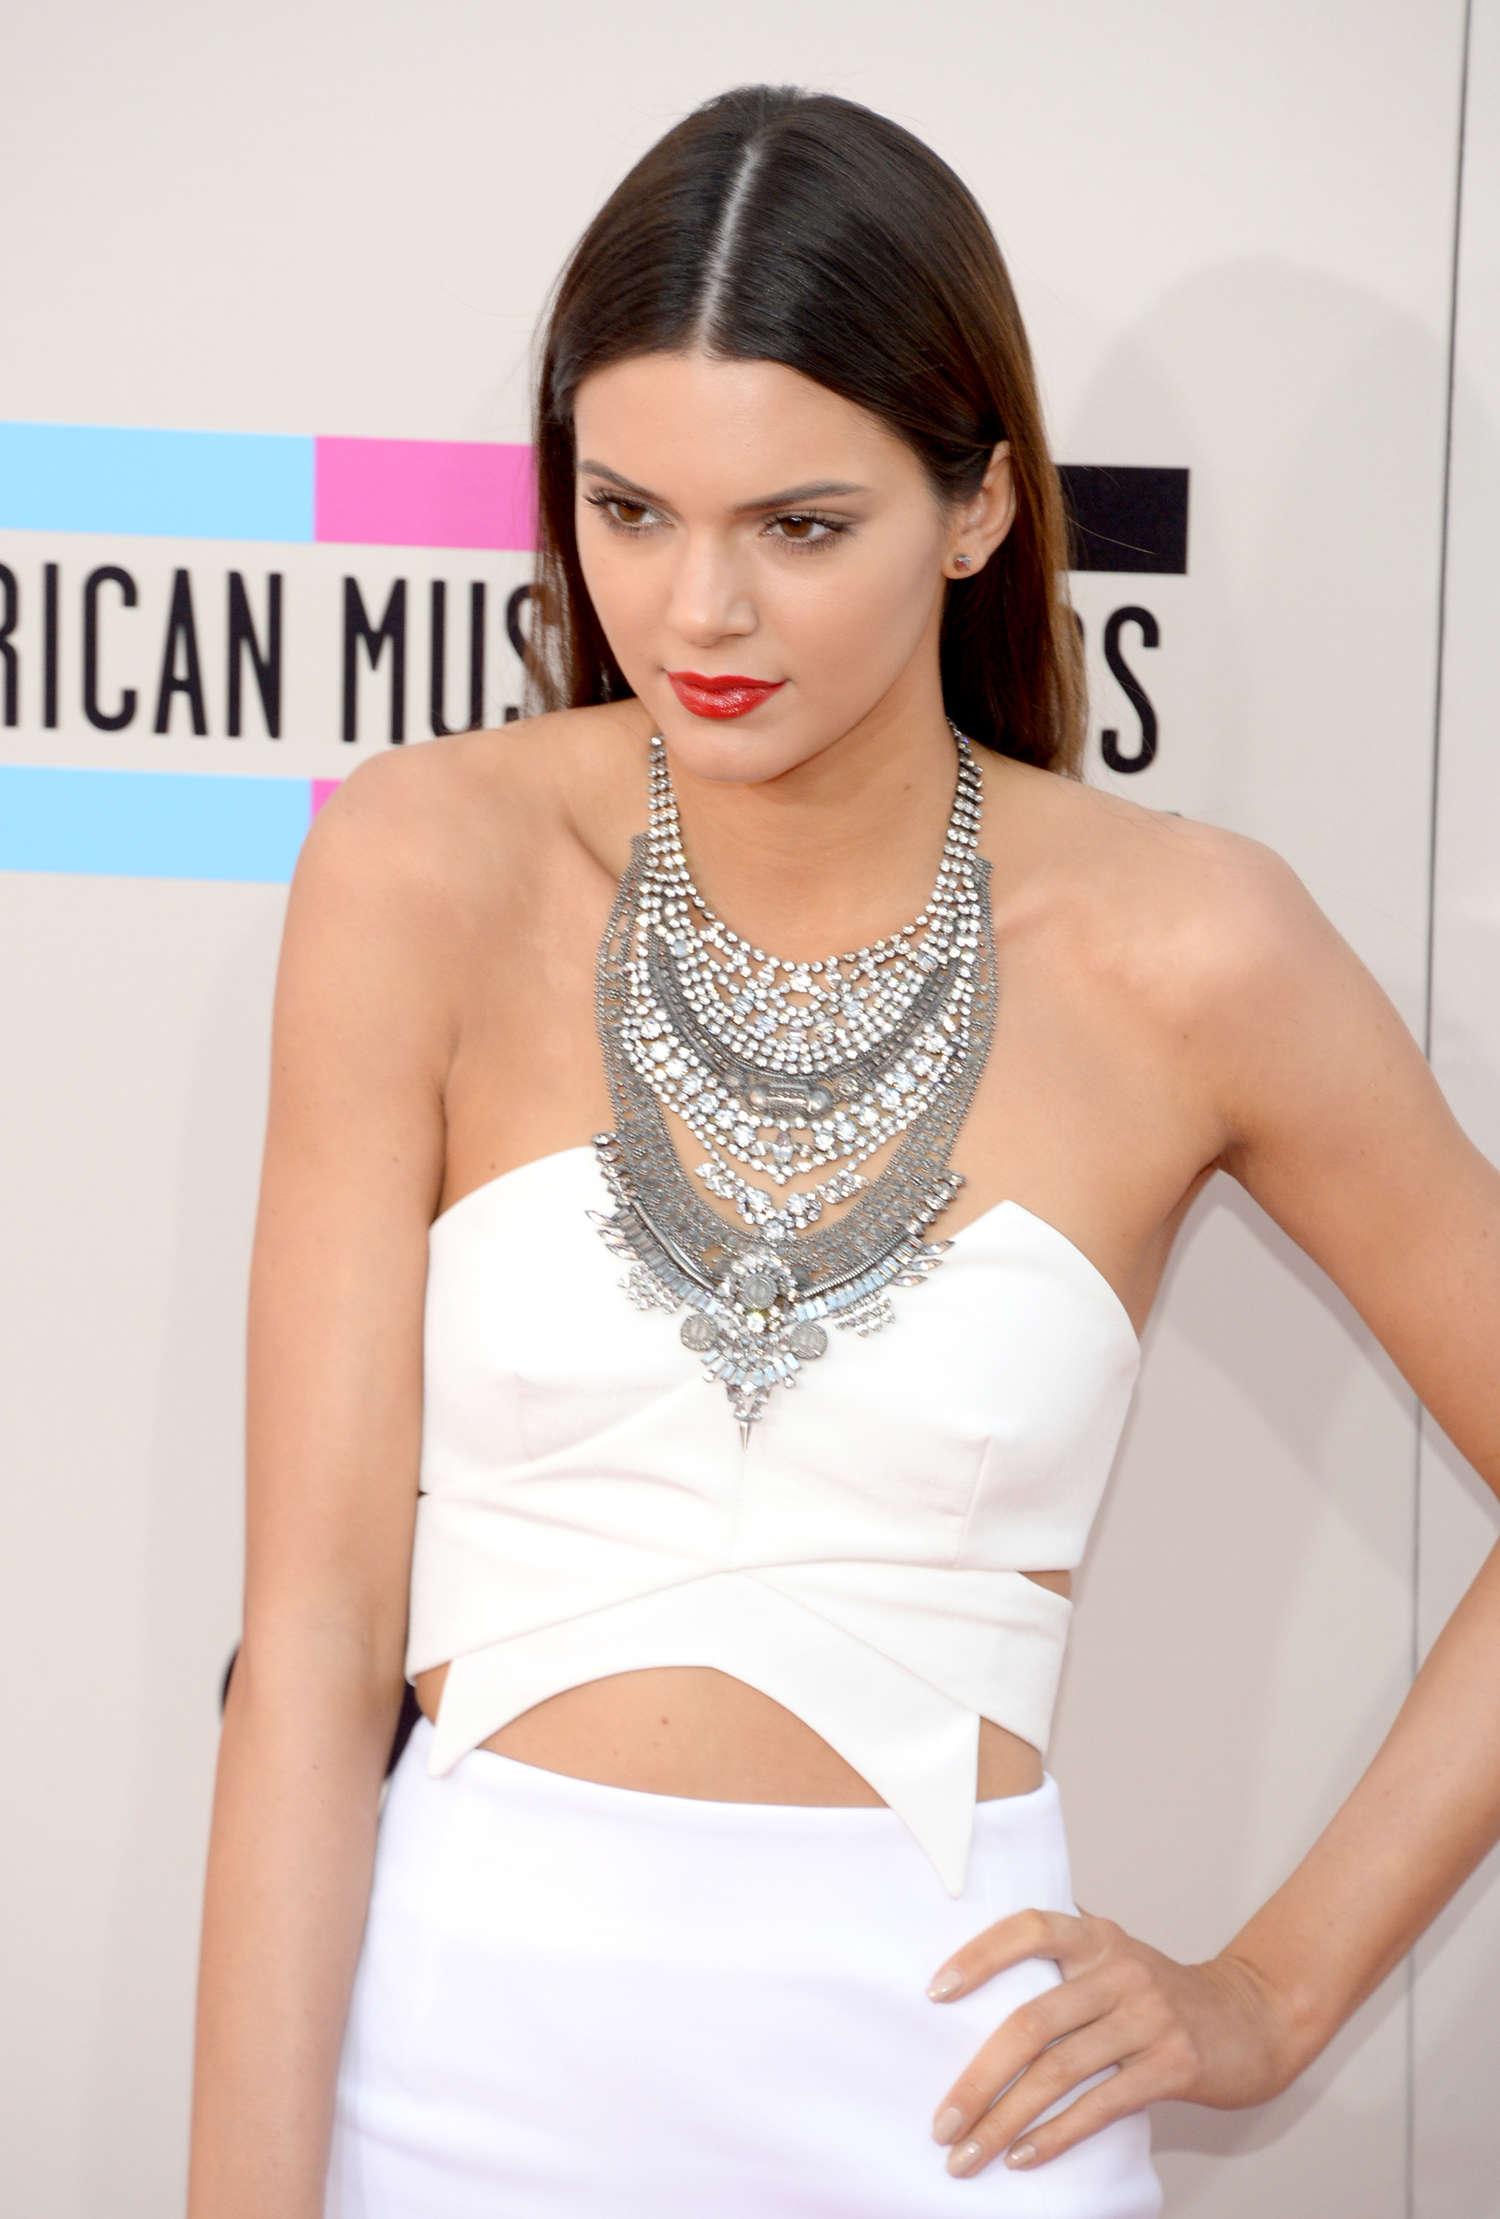 Kendall Jenner: 2013 American Music Awards -01 – GotCelebKendall Jenner 2013 Hair